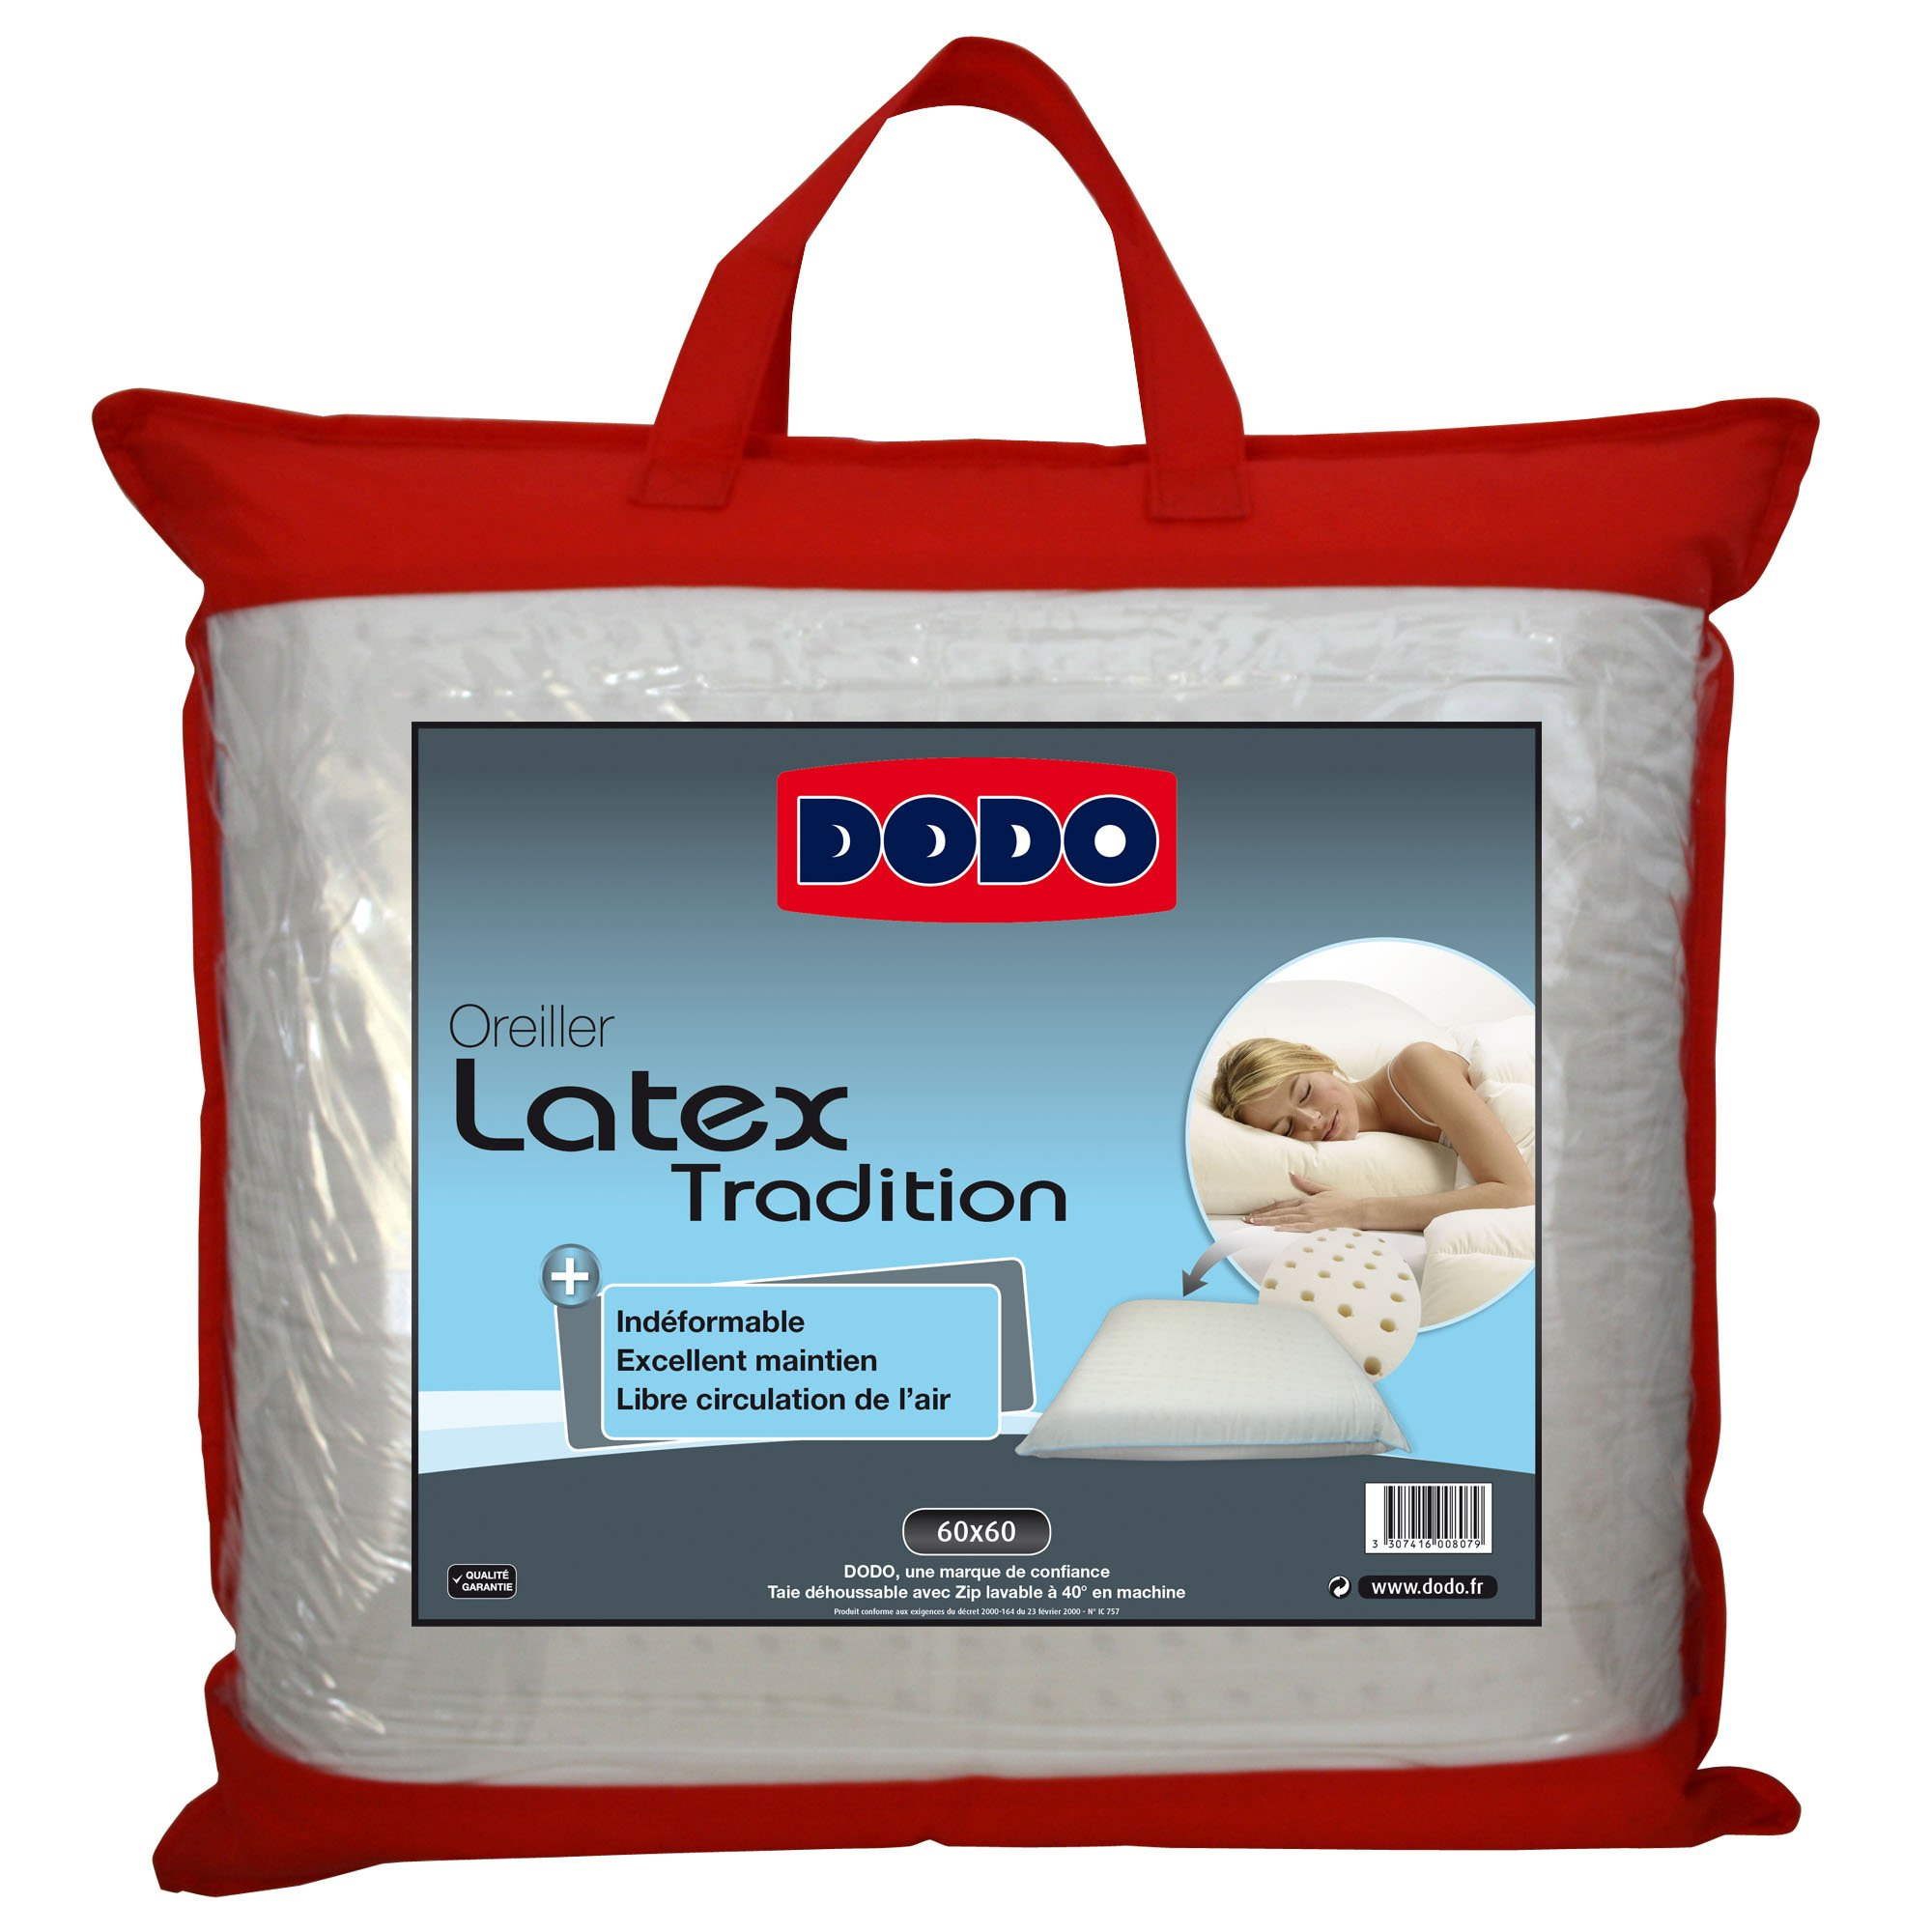 Dodo 60080.606 Oreiller Ergonomique Latex 60 cm x 60 cm product image